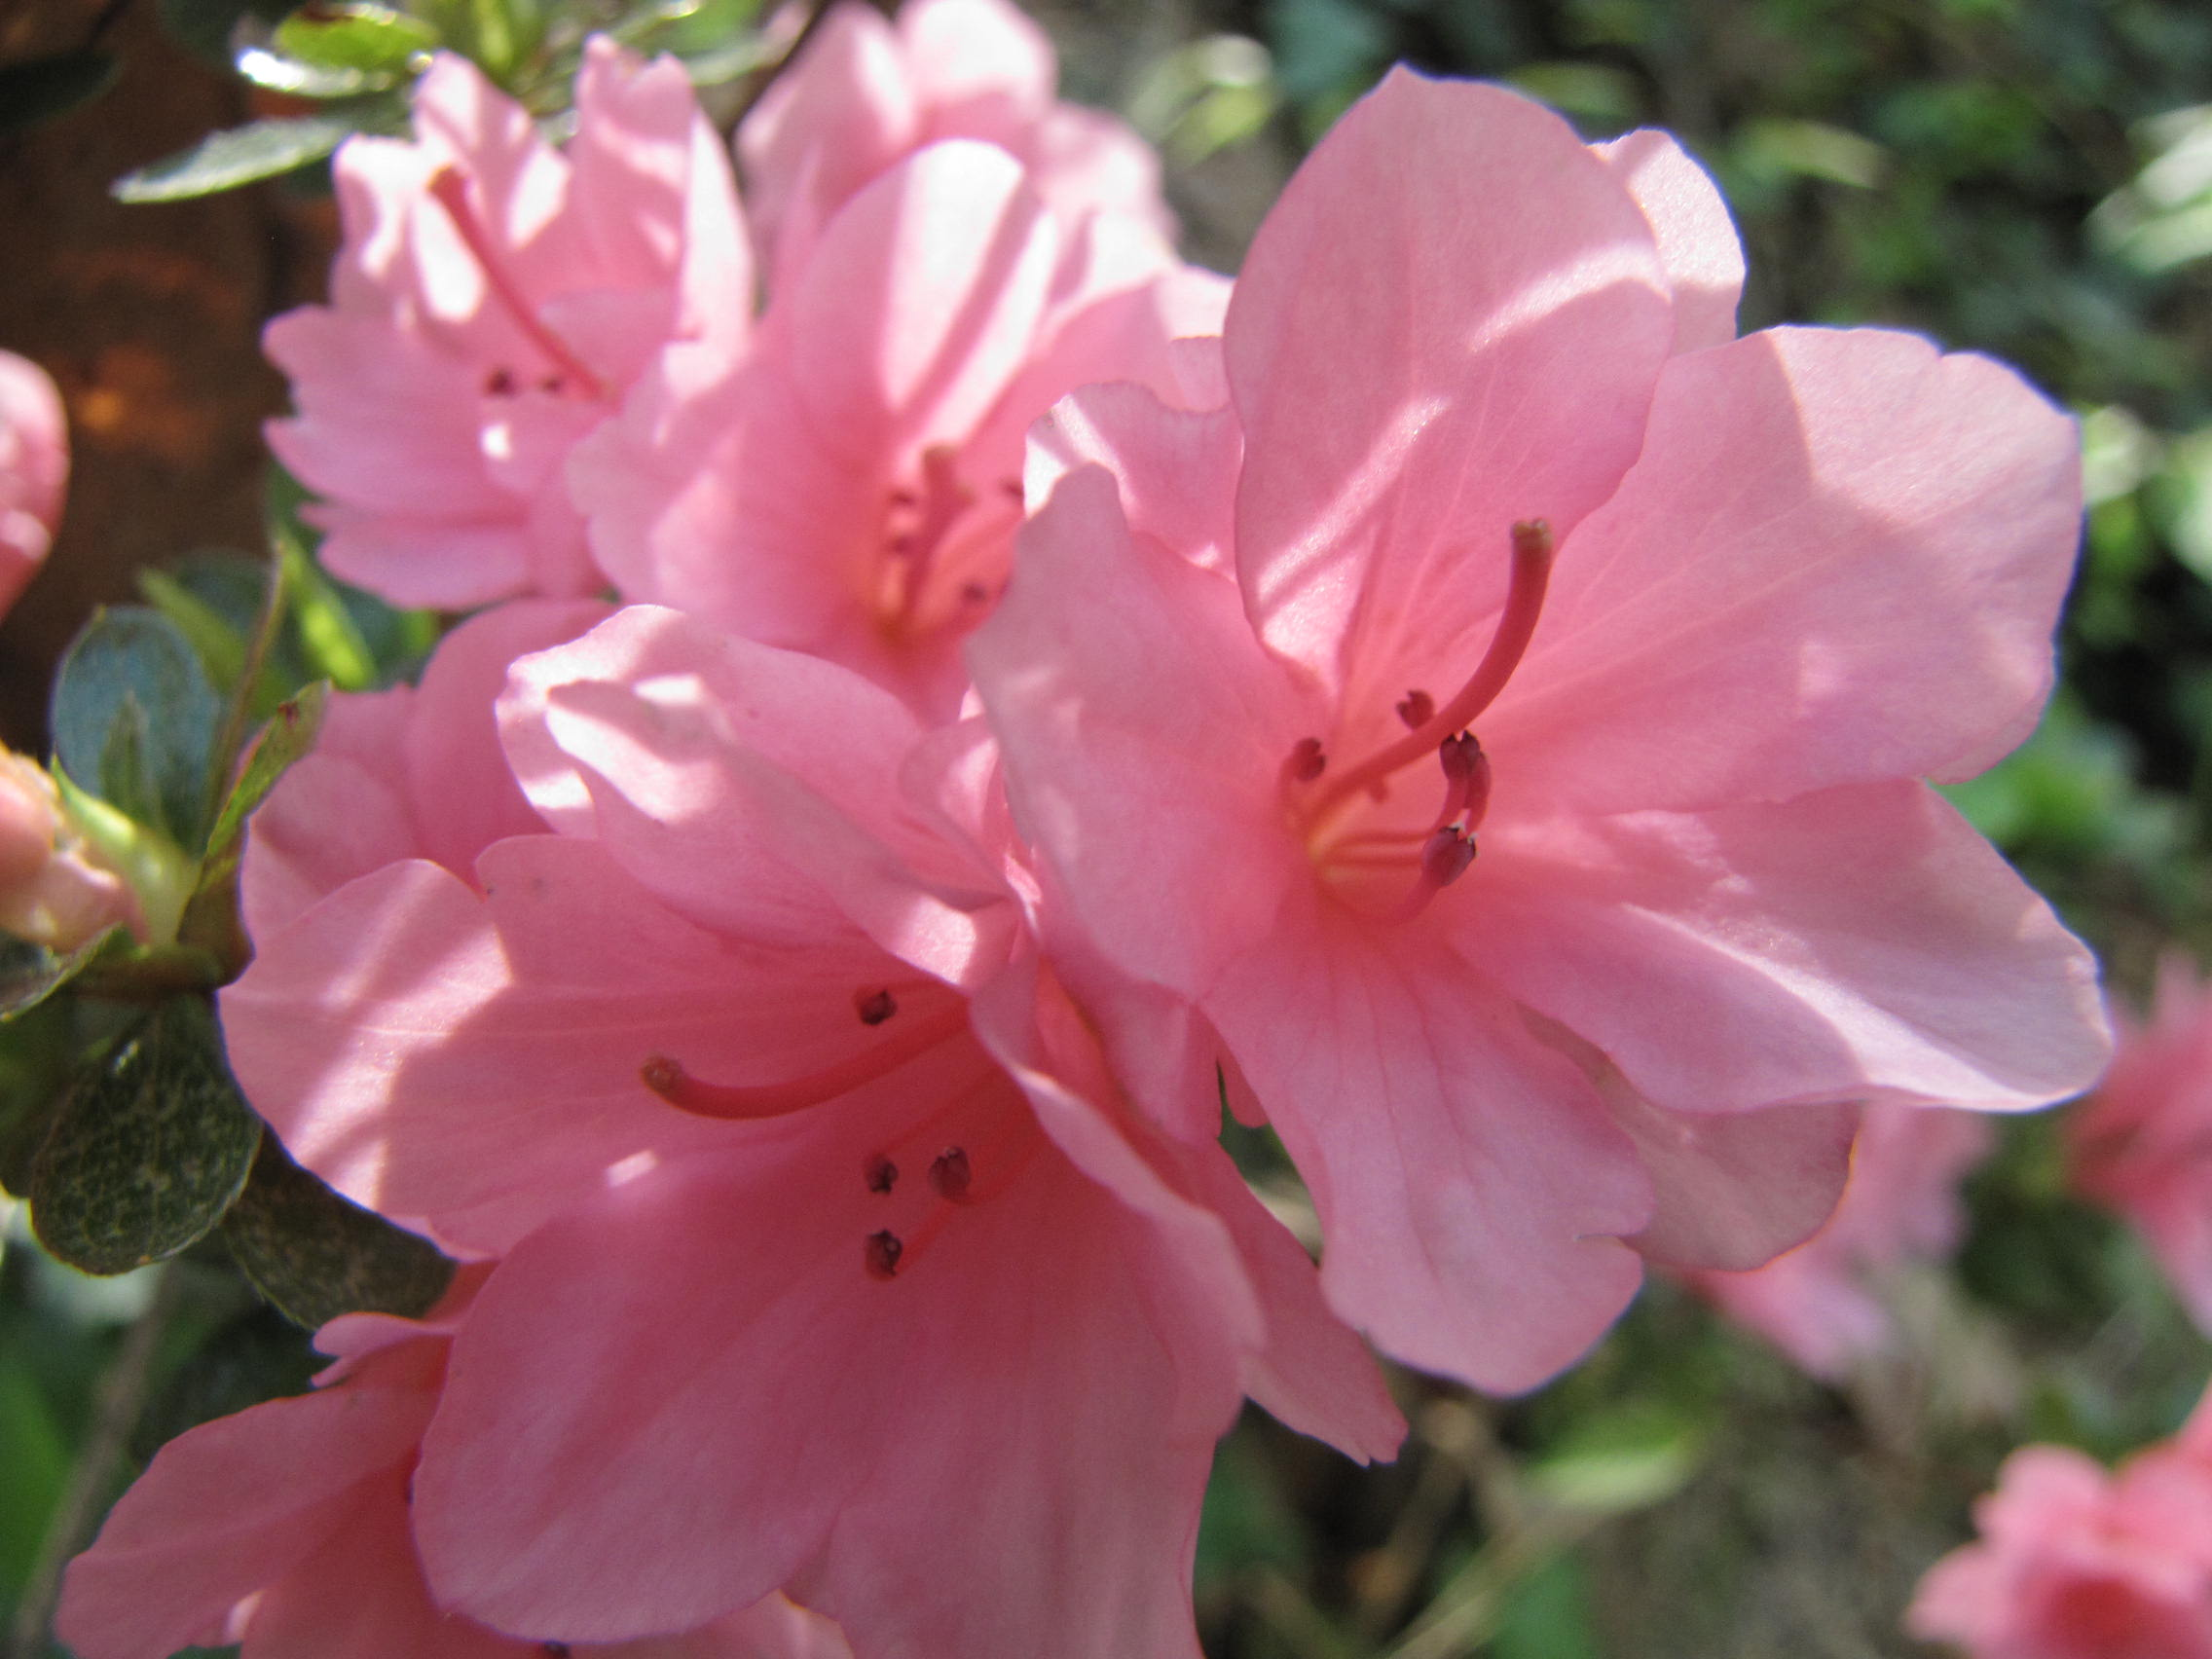 Pretty Pink Flowers by prettypunkae on DeviantArt